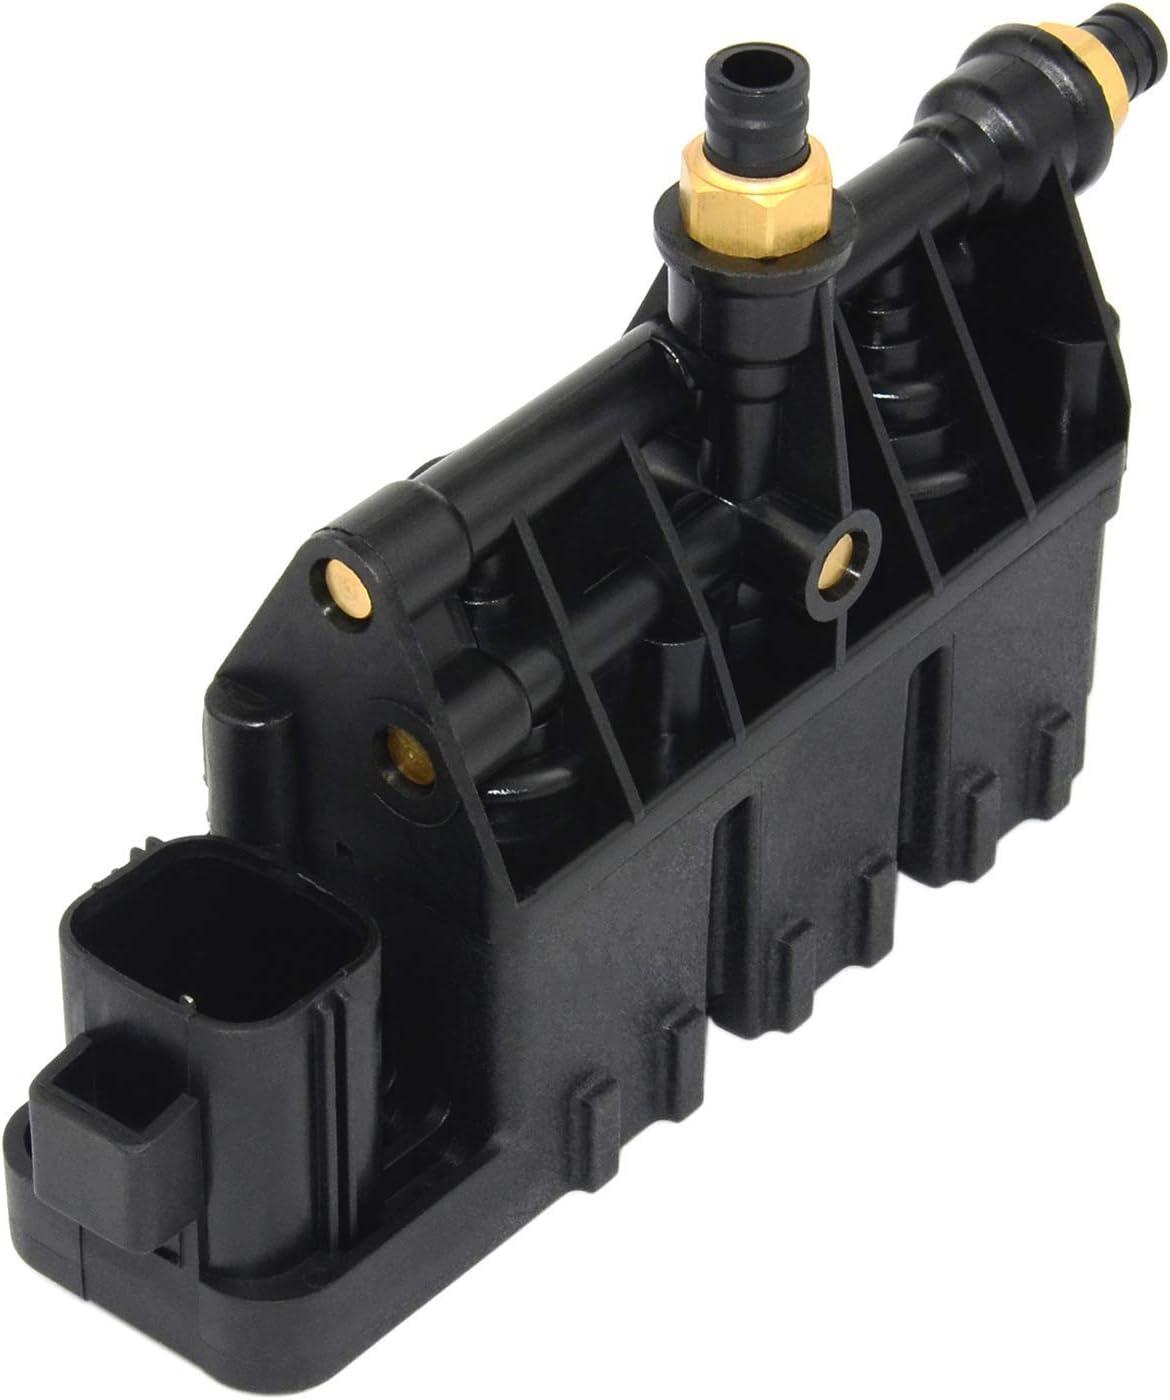 Front Air Suspension Compressor Valve Block for Land Range Rover Sport LR3 LR4 OE RVH000095